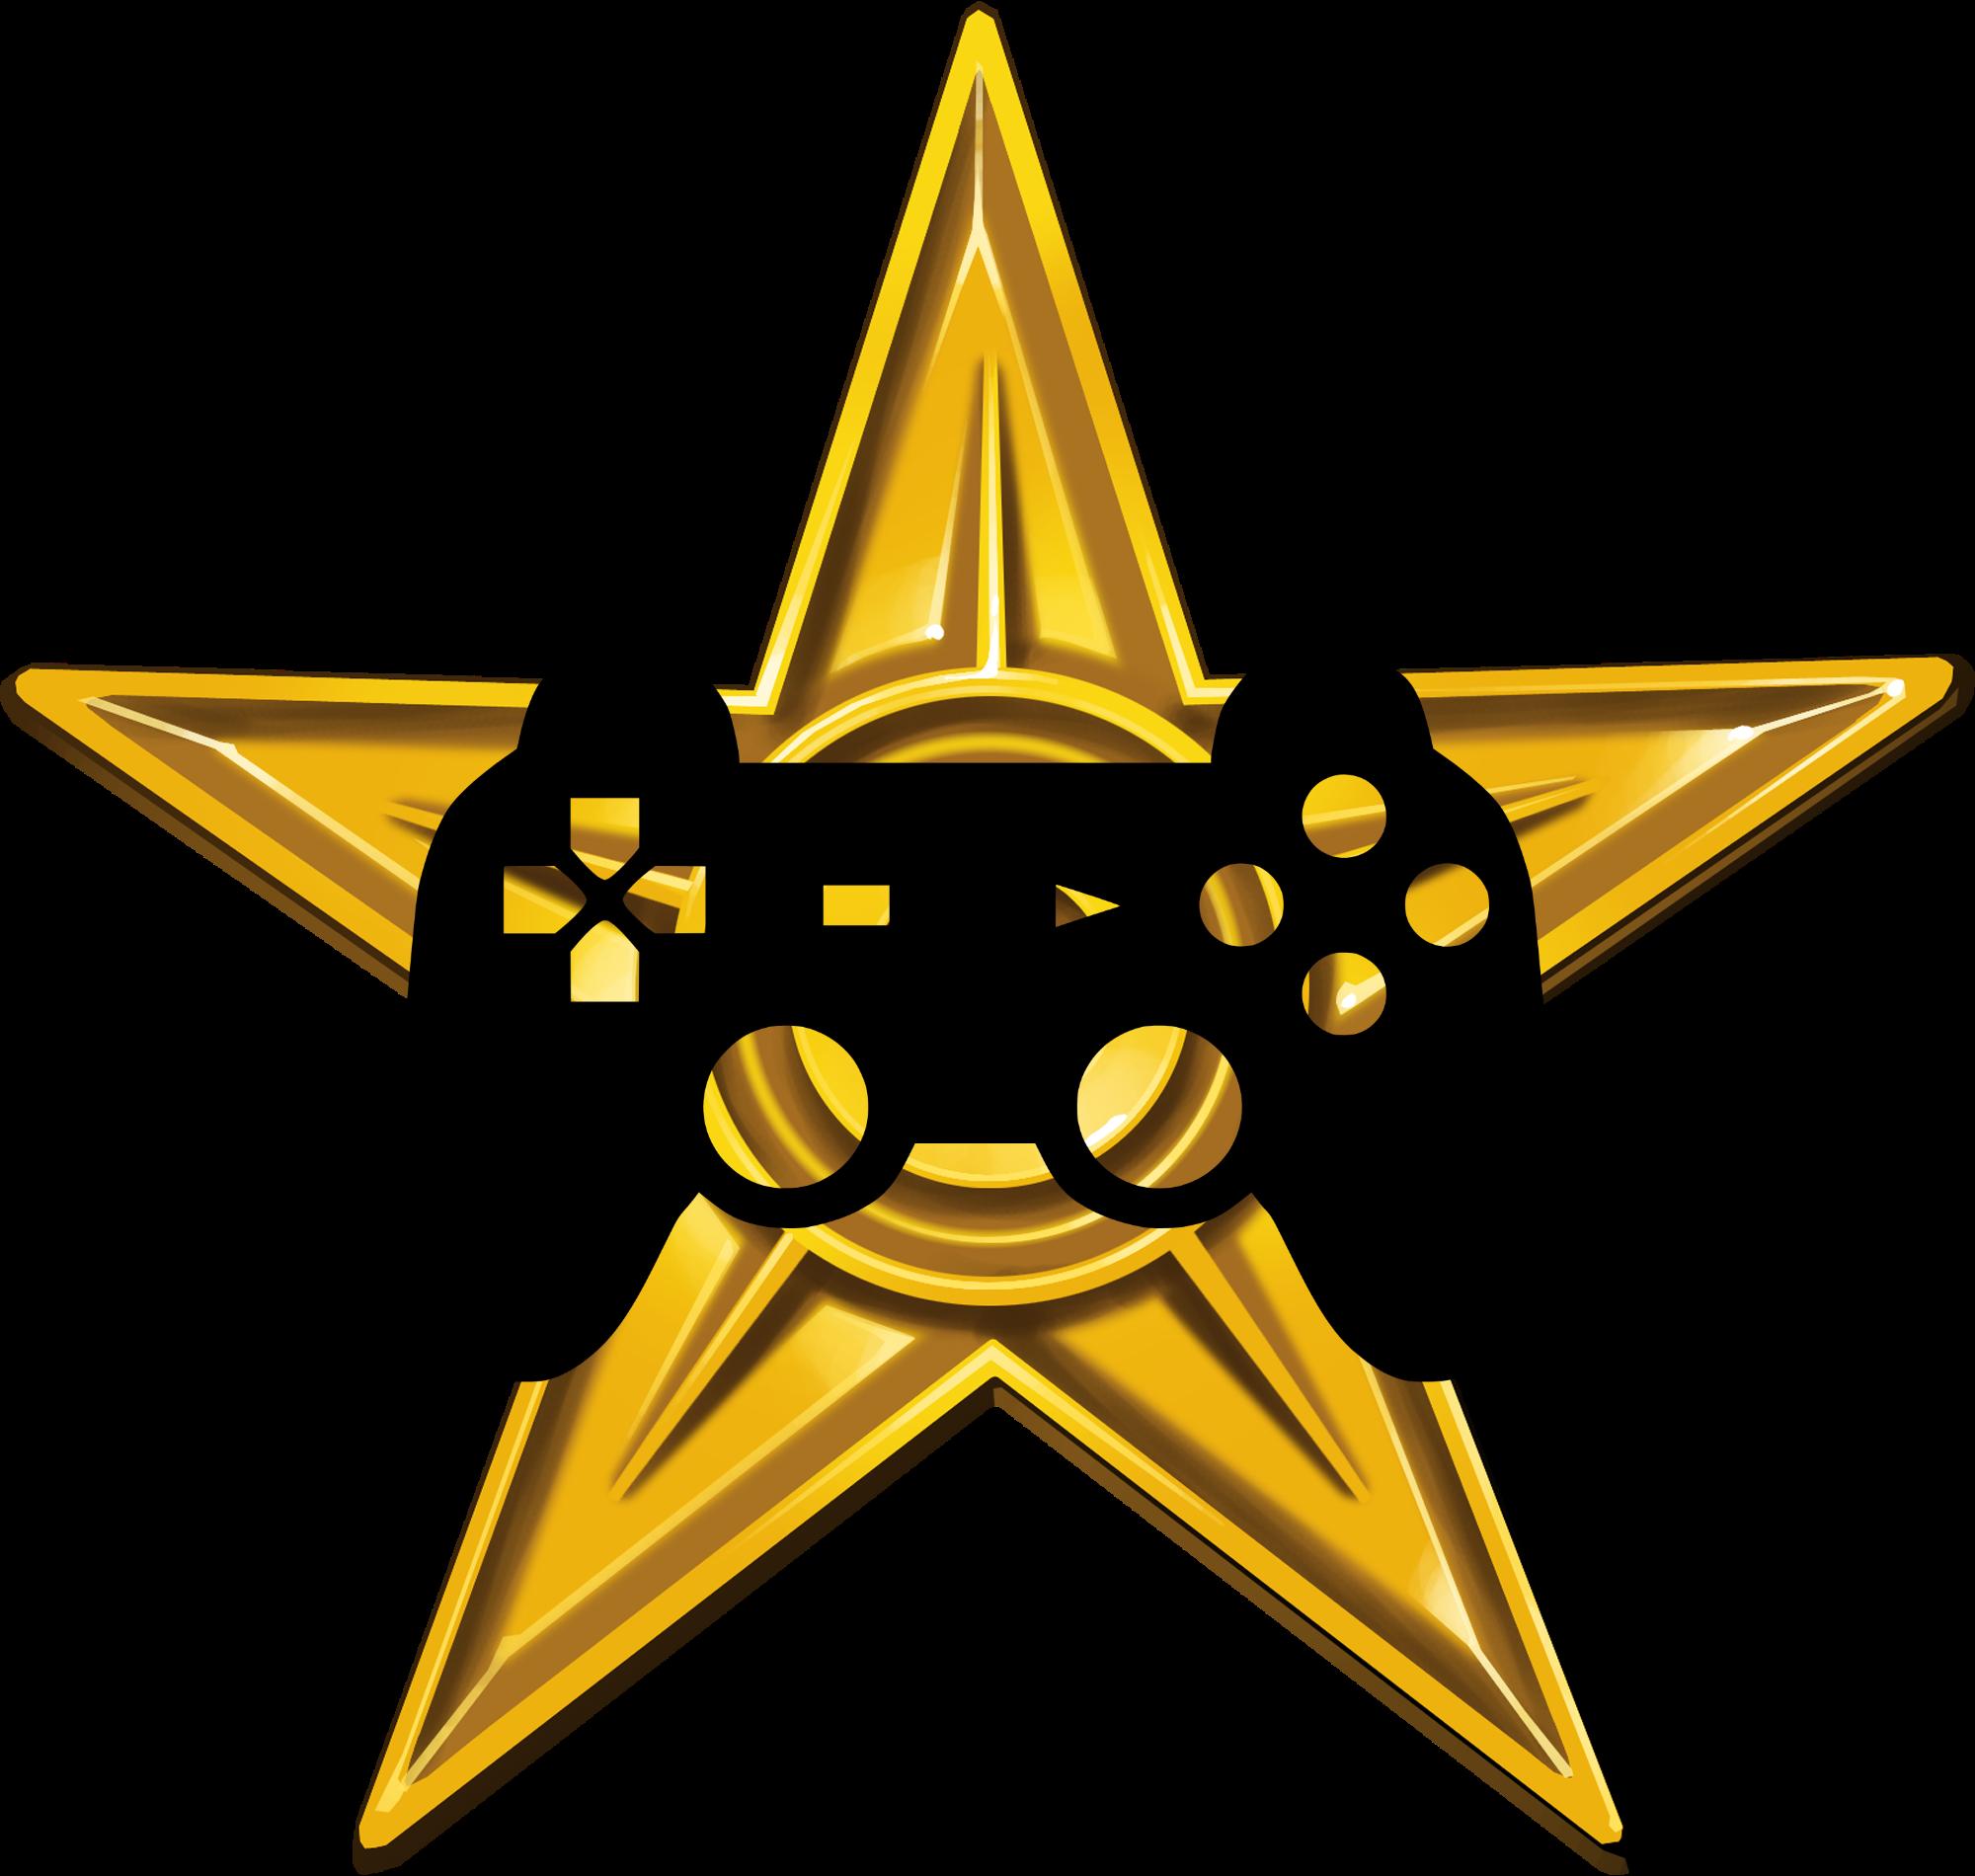 AzWiki Video Games Gold Barnstar.png English: Gold barnstar for Video game thematic editing month on en:Azerbaijani Wikipedia. Azərbaycanca: